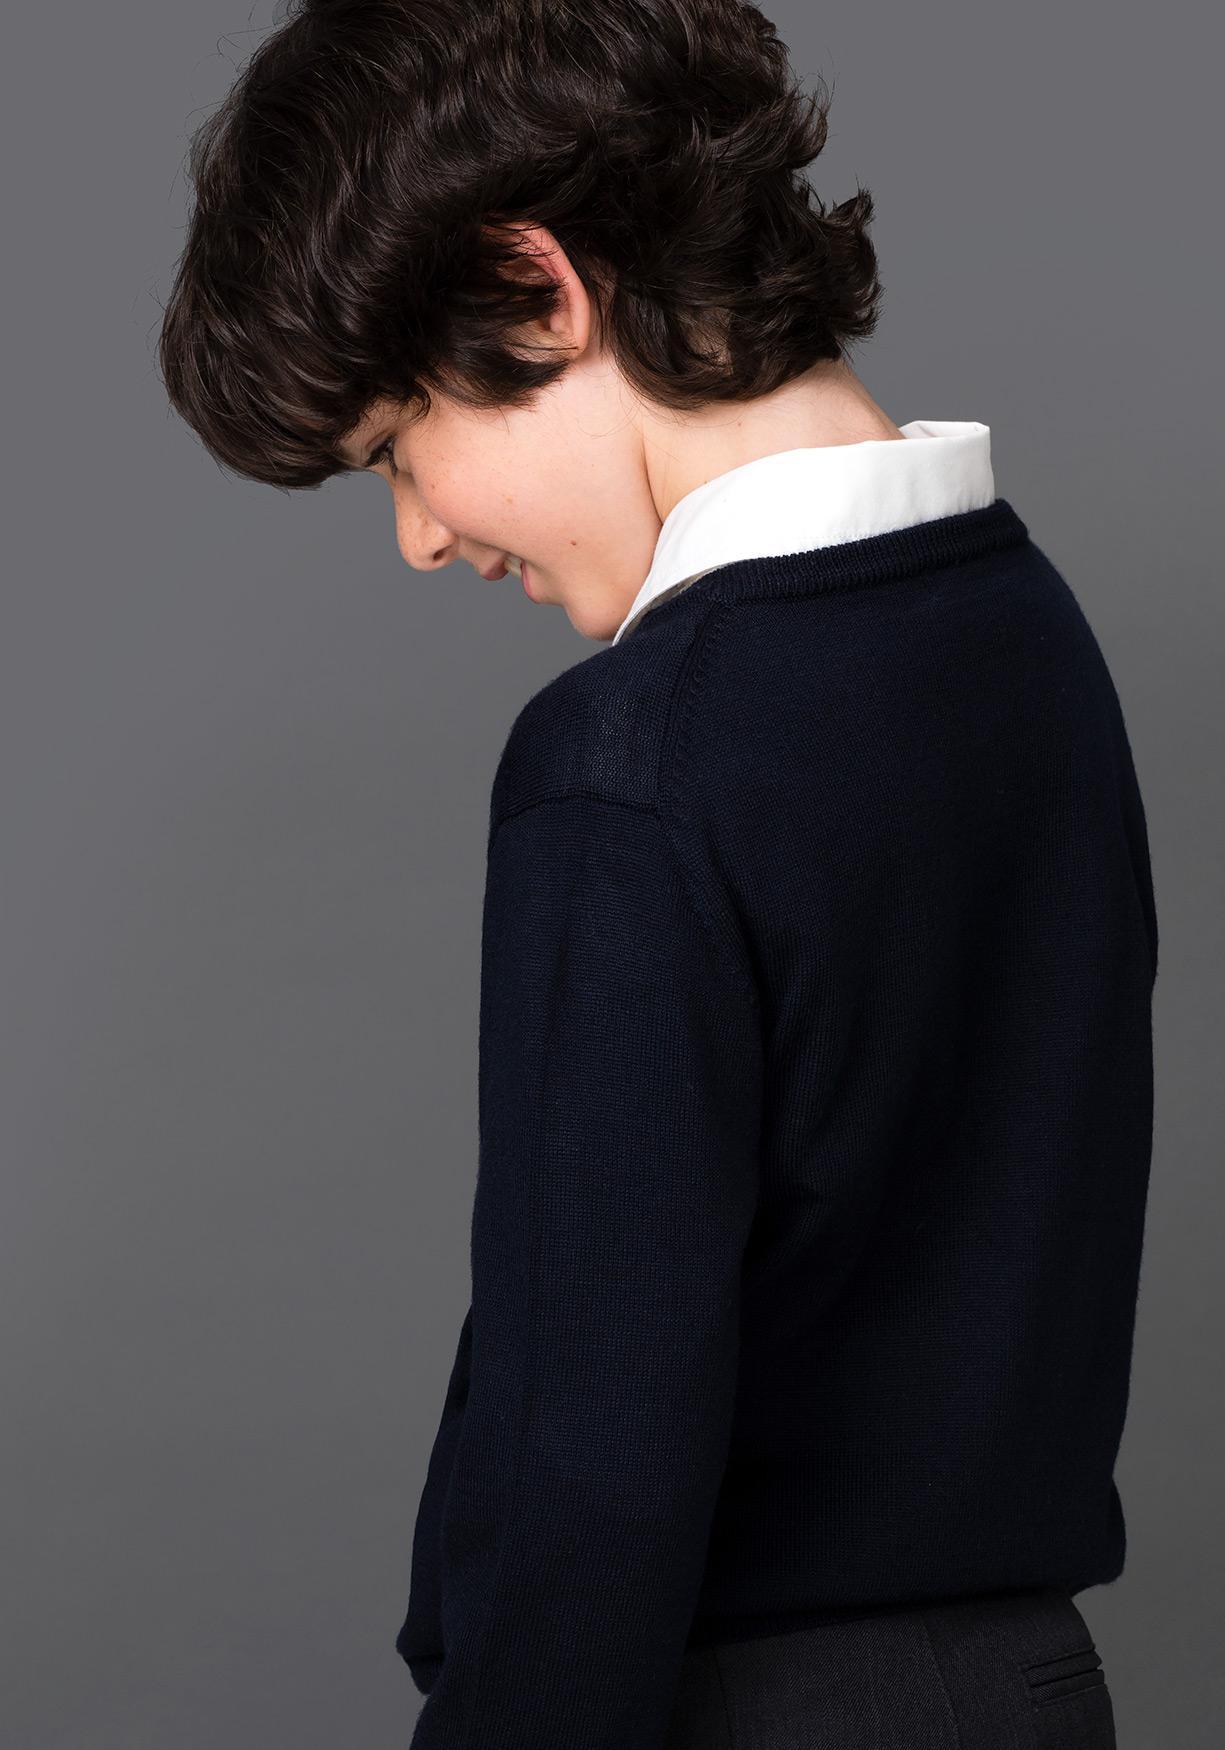 Comprar Jersey de lana unisex para uniforme (tallas 3 a 16 años) TEX ... a3f16e524bc1